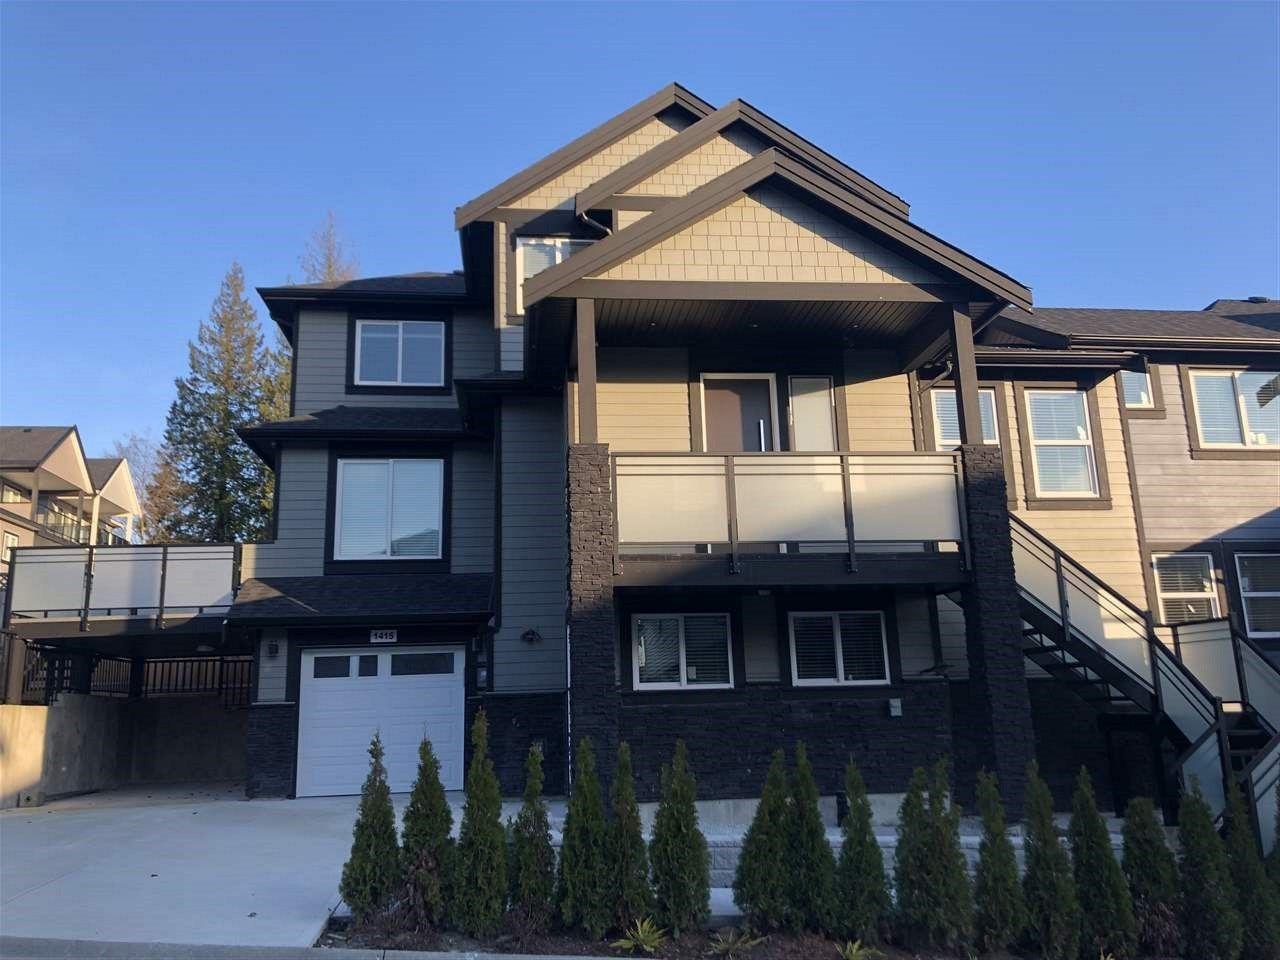 Main Photo: 1415 DUCHESS STREET in Coquitlam: Burke Mountain 1/2 Duplex for sale : MLS®# R2421589